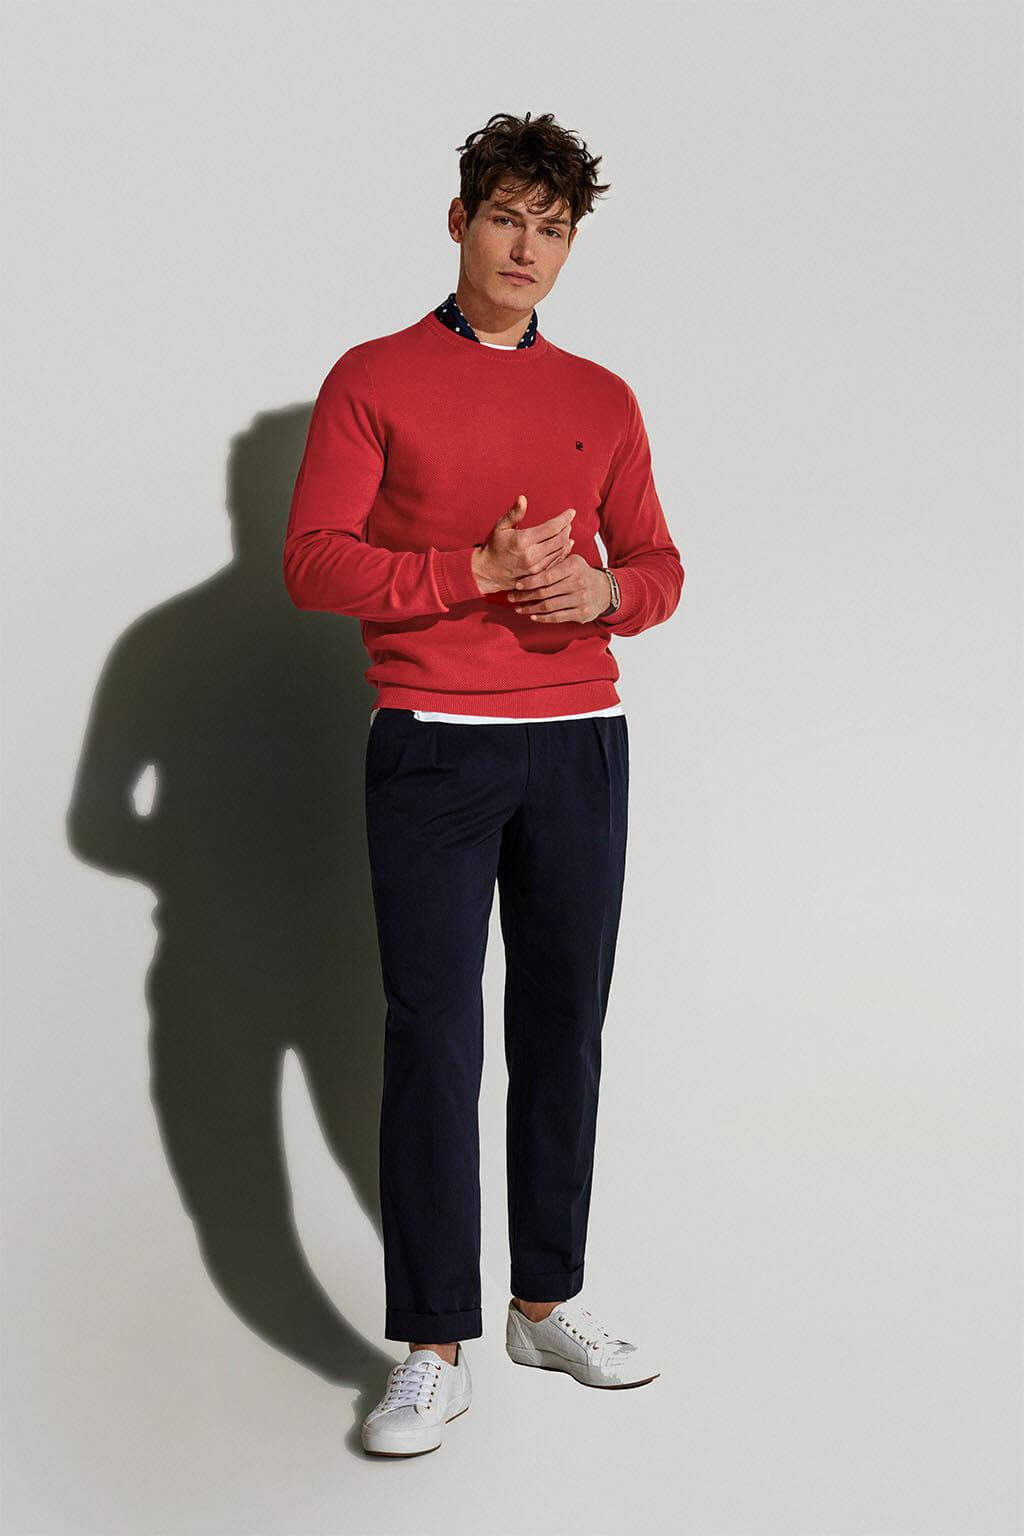 CH Carolina Herrera. New Menswear Collection Summer. Look 02